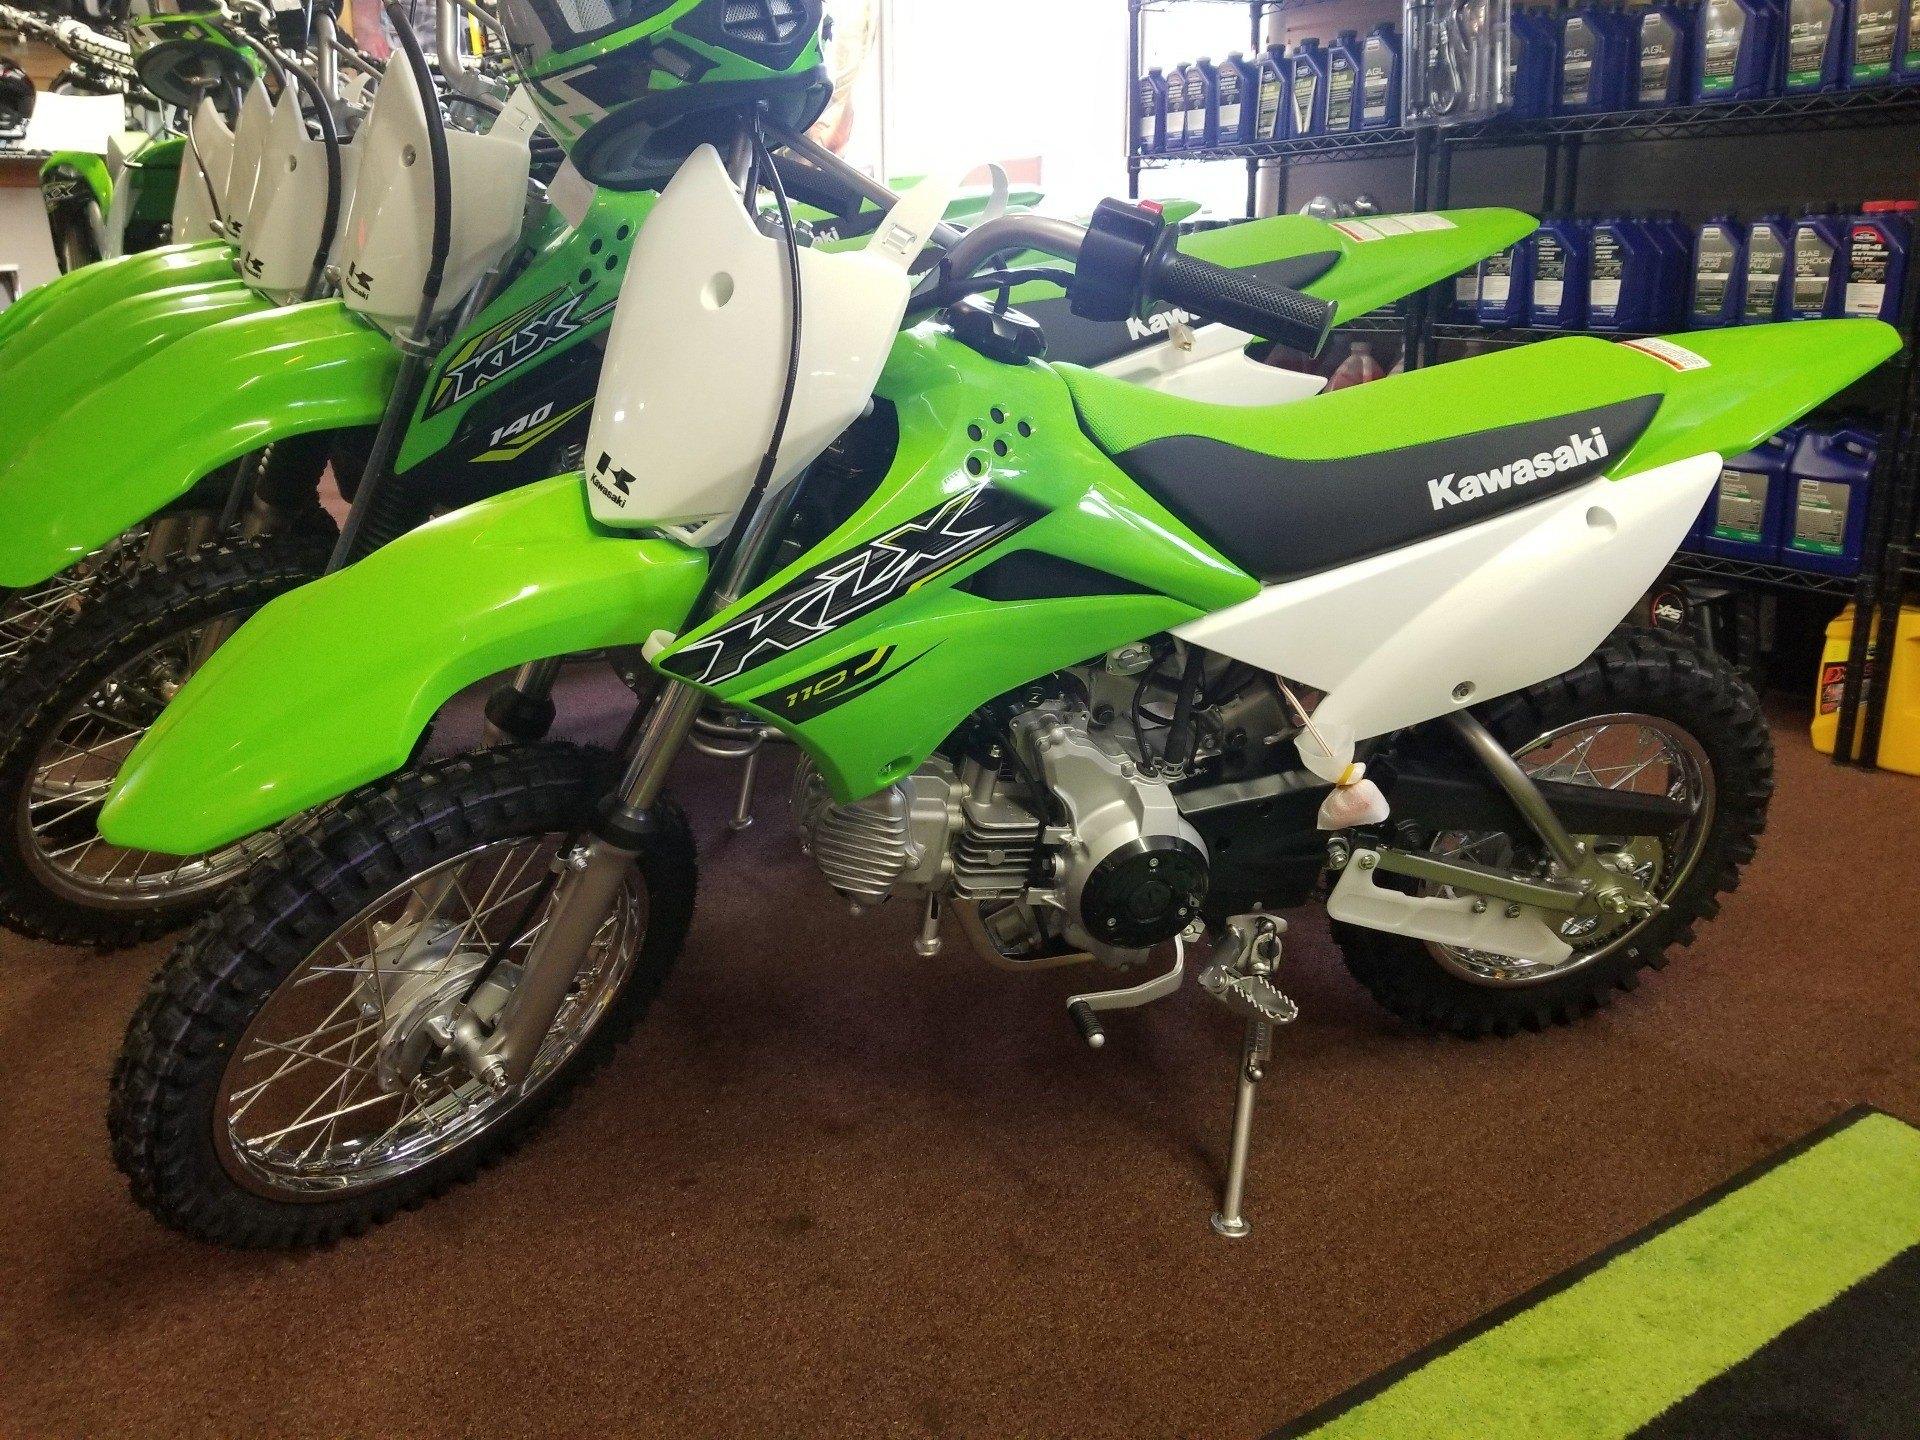 New 2019 Kawasaki KLX 110 Motorcycles in Ledgewood, NJ